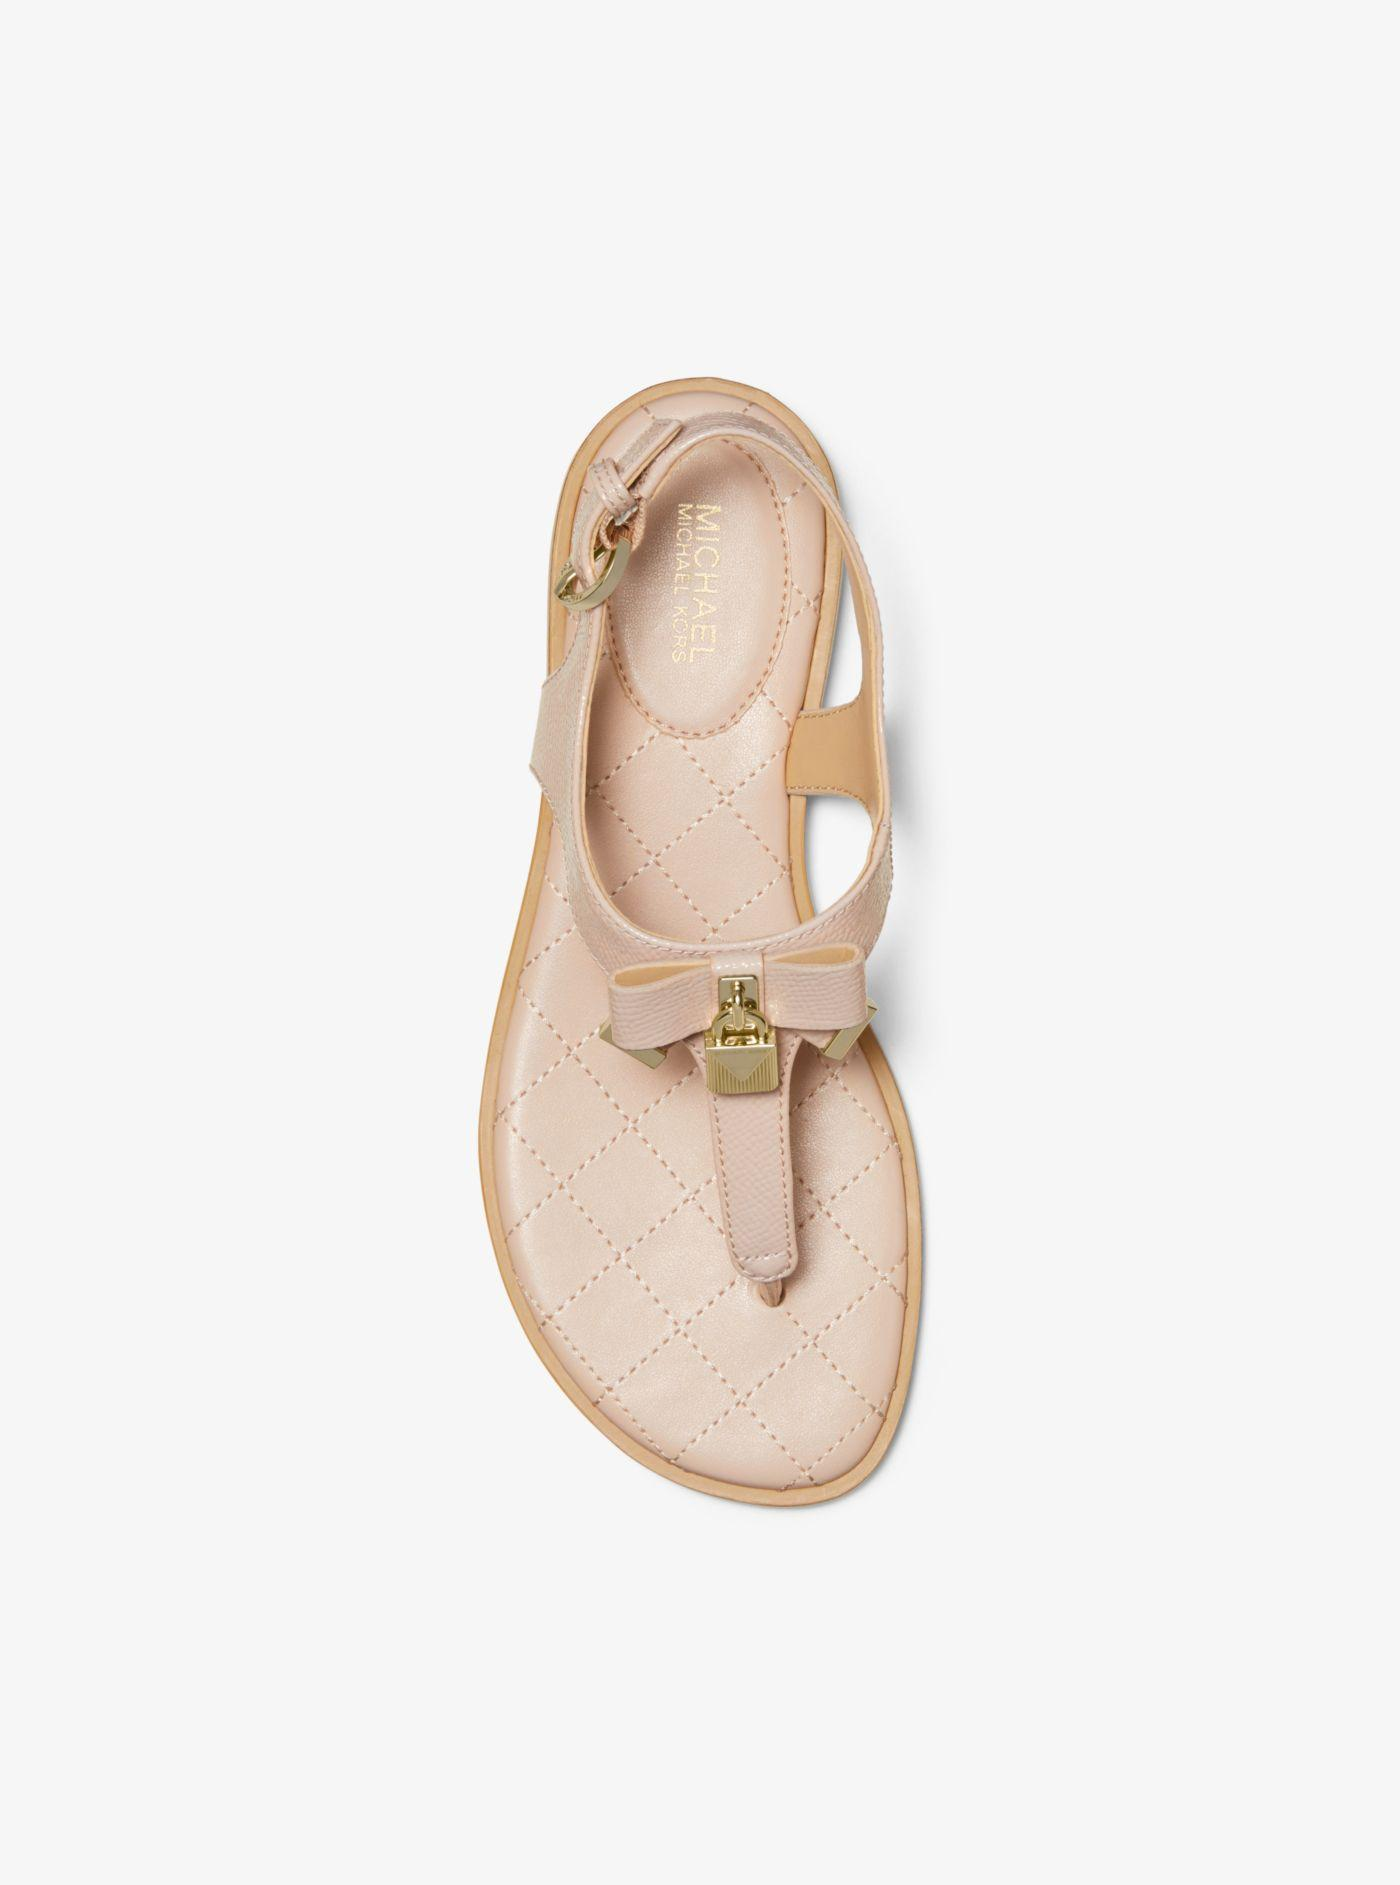 Michael Kors Alice Patent Leather